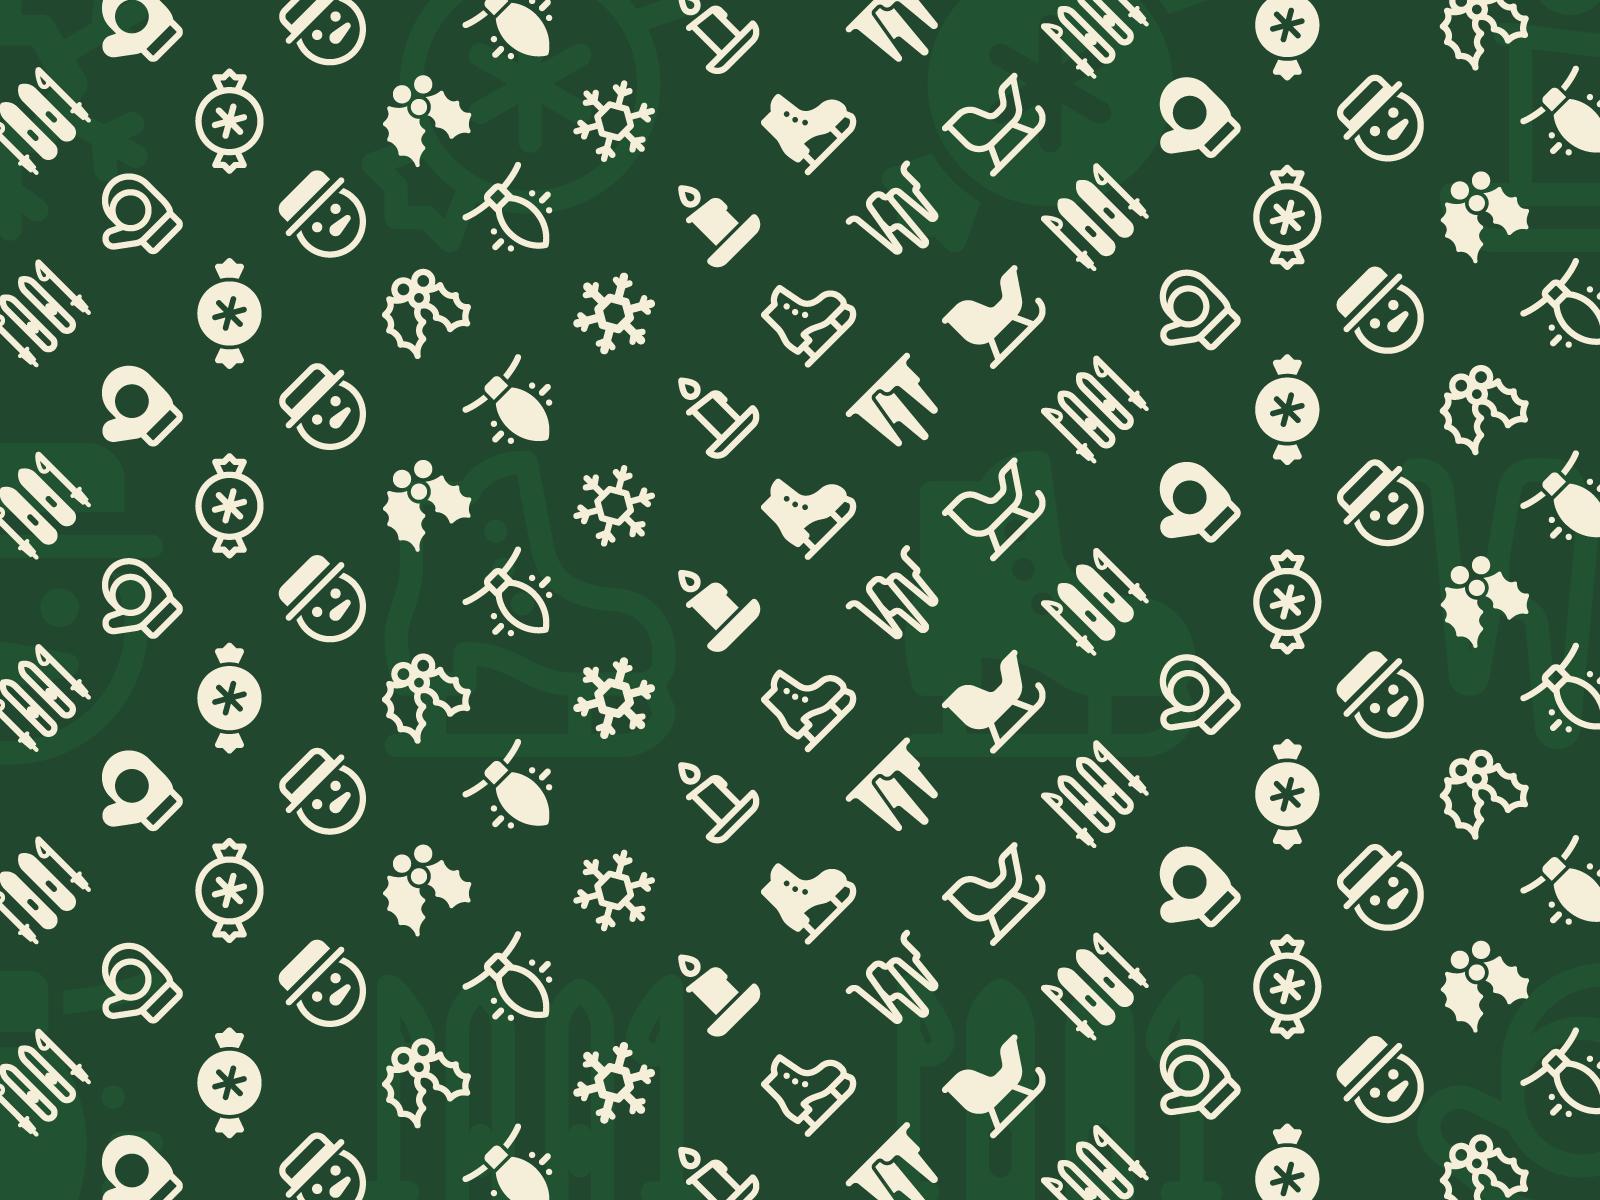 icons8 christmas illustration pattern